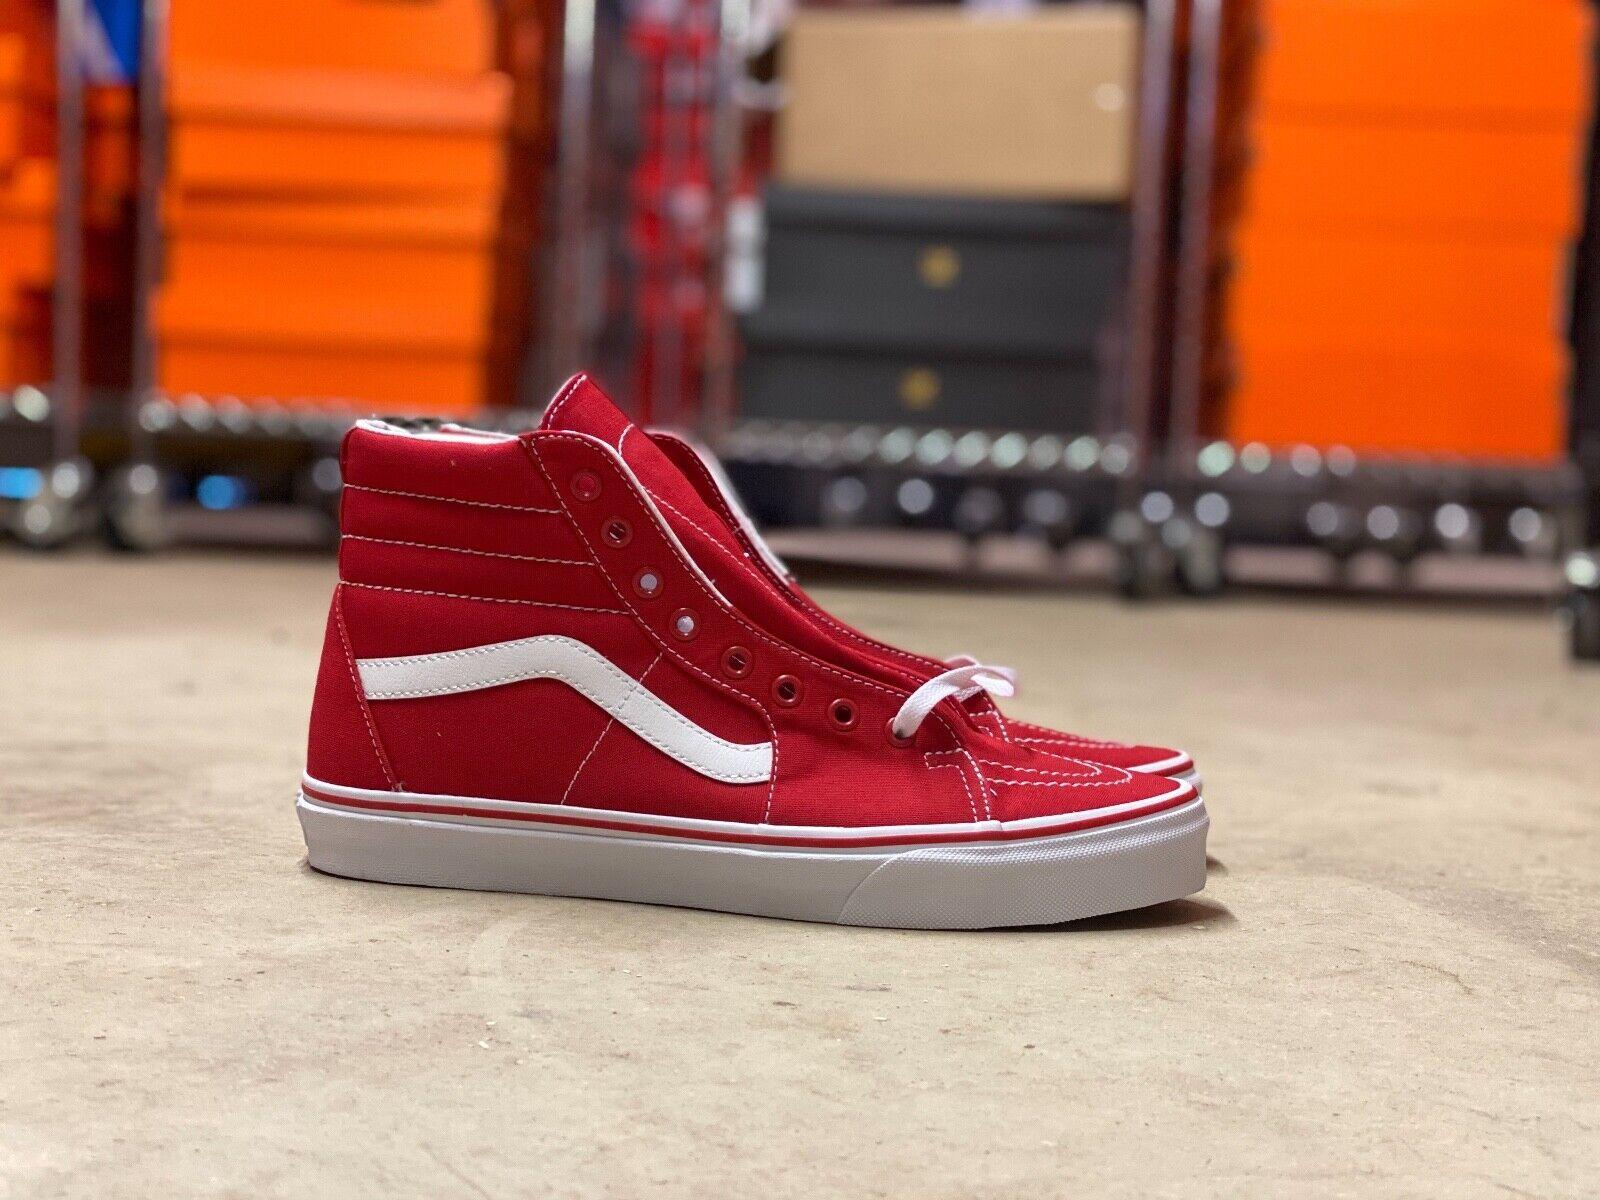 VANS Sk8-hi Skate Shoes Mono Canvas Red